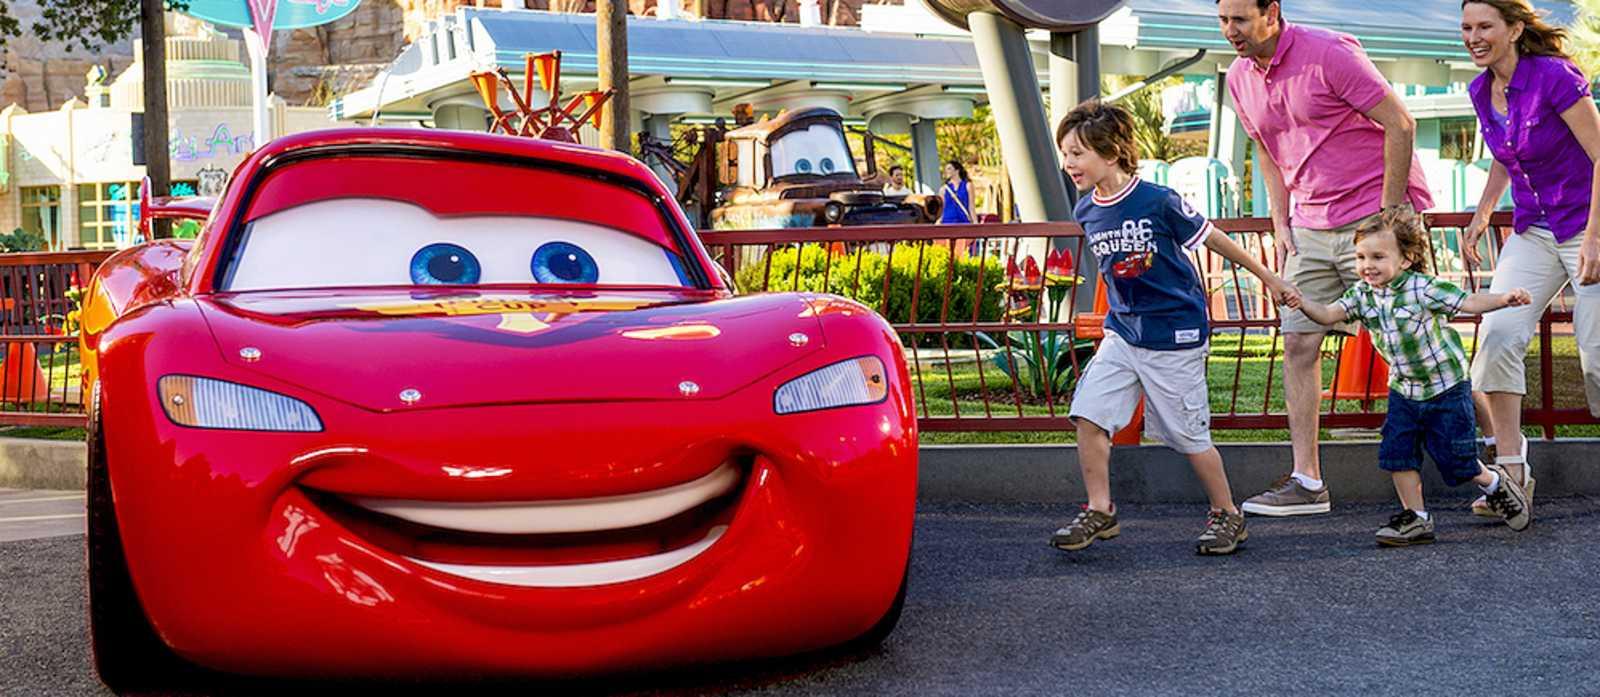 Disneyland Cars